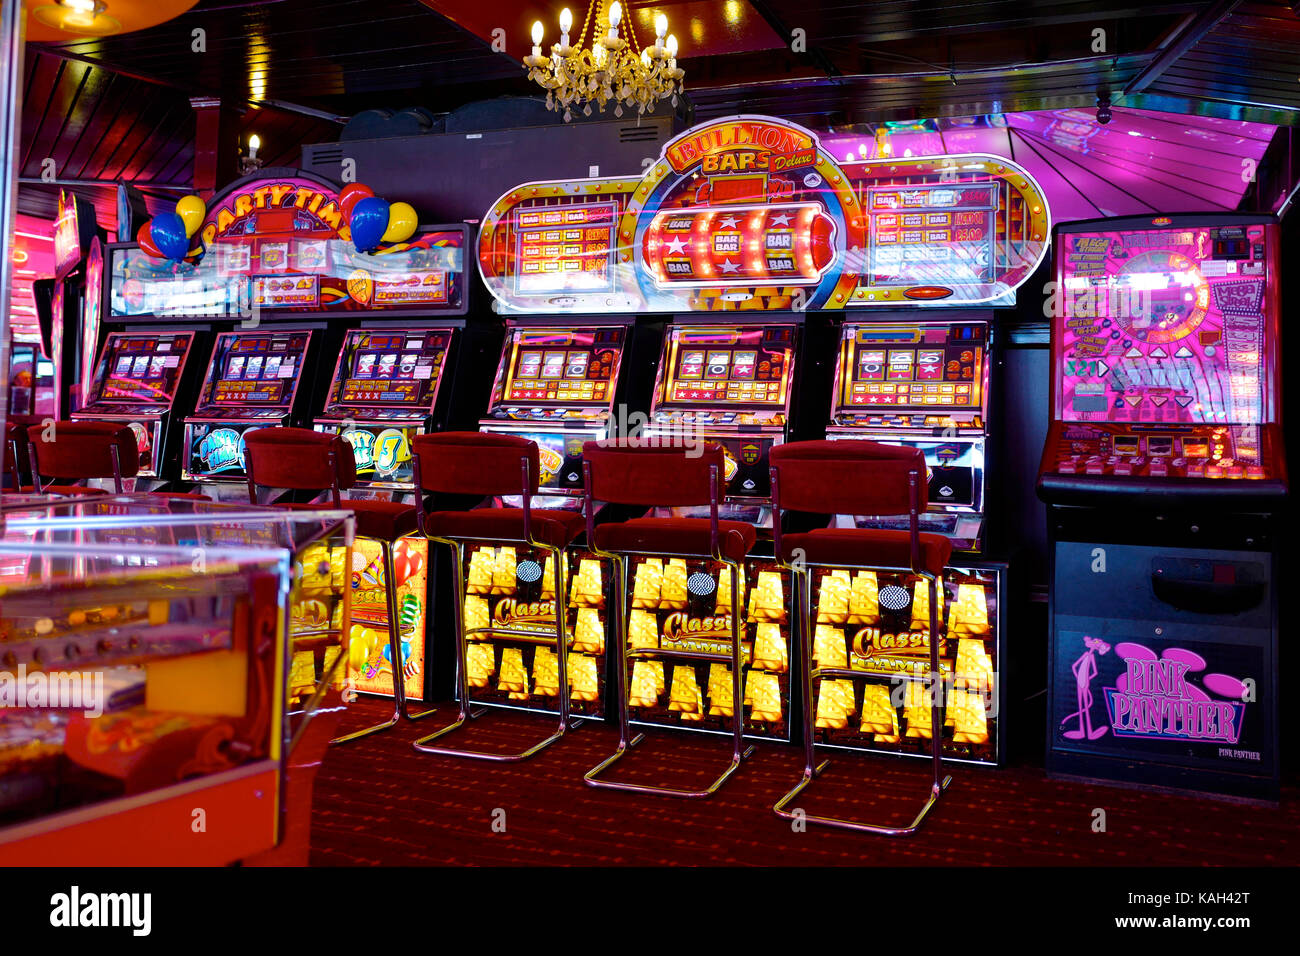 Gambling machines in amusement arcade, UK - Stock Image